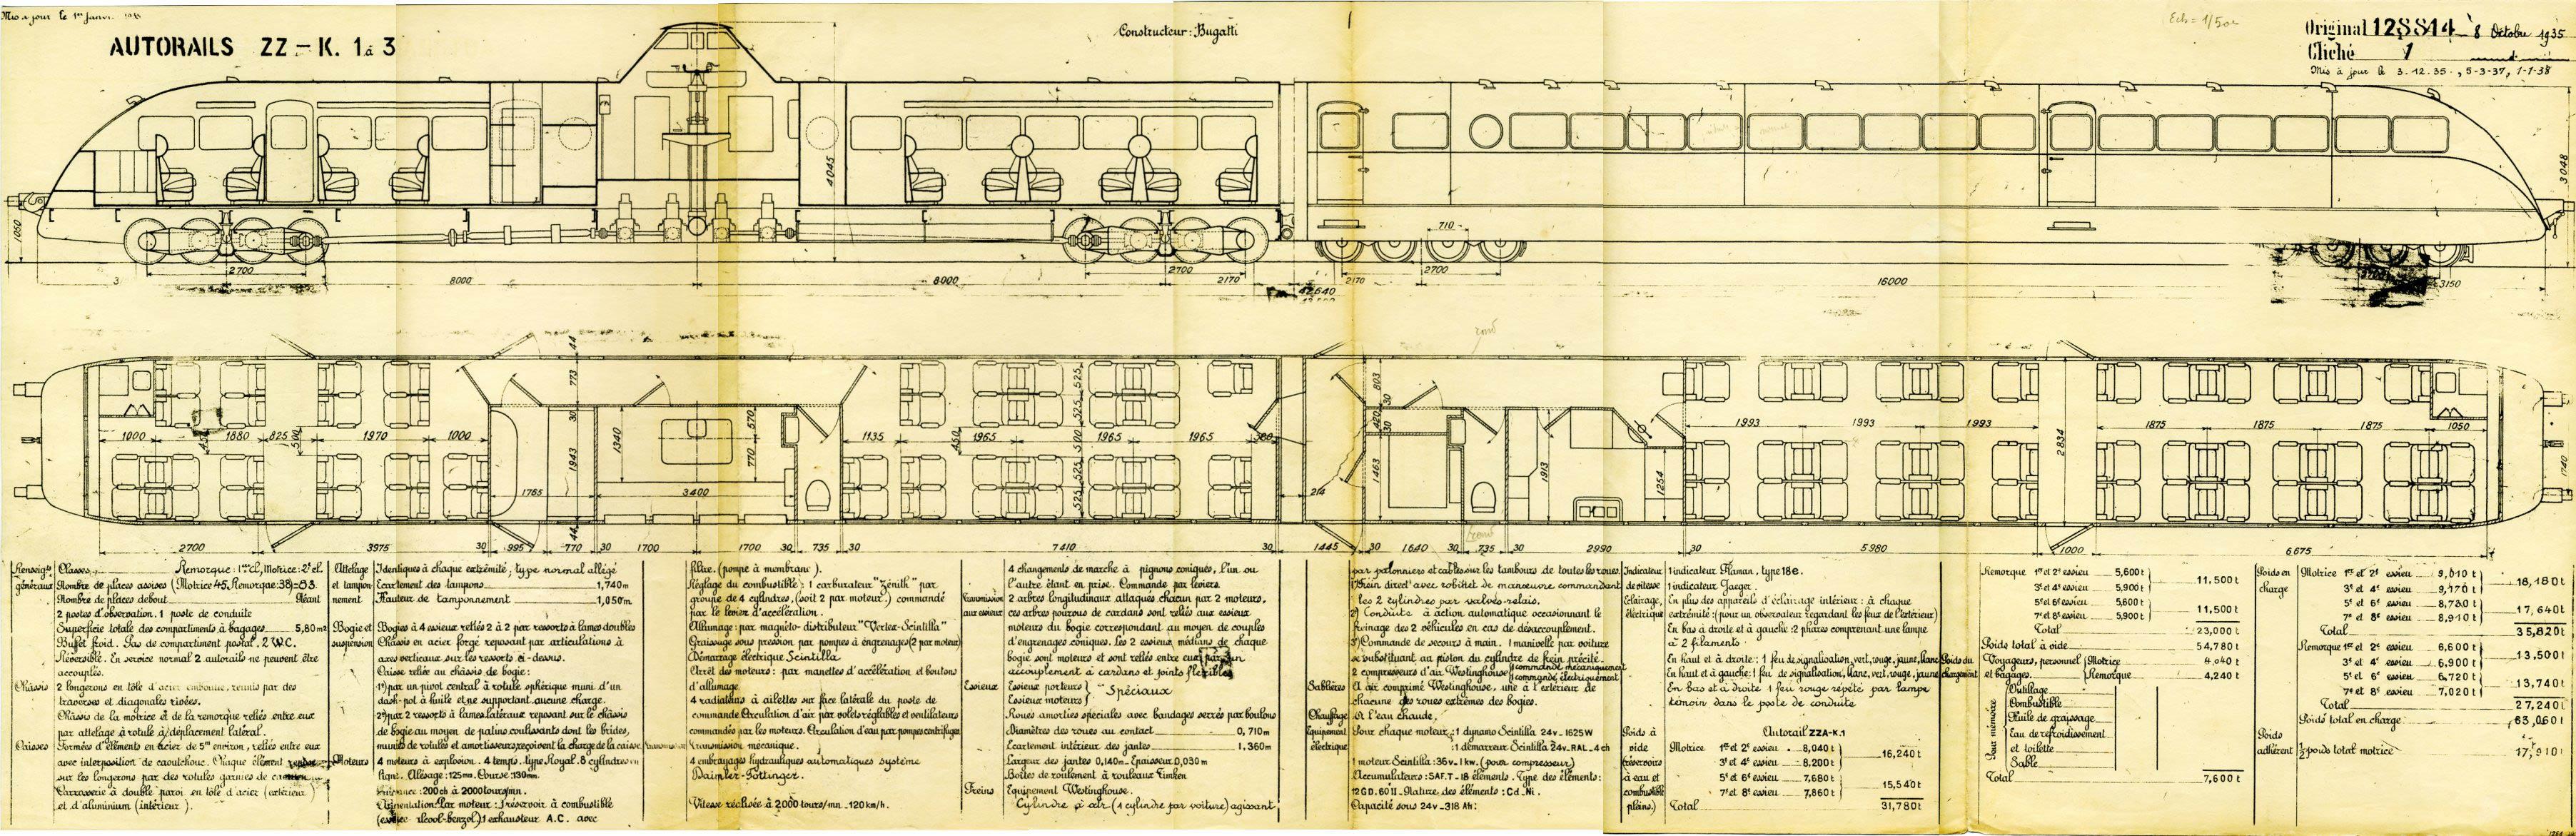 autorails bugatti french railcars of the 1930s retours to